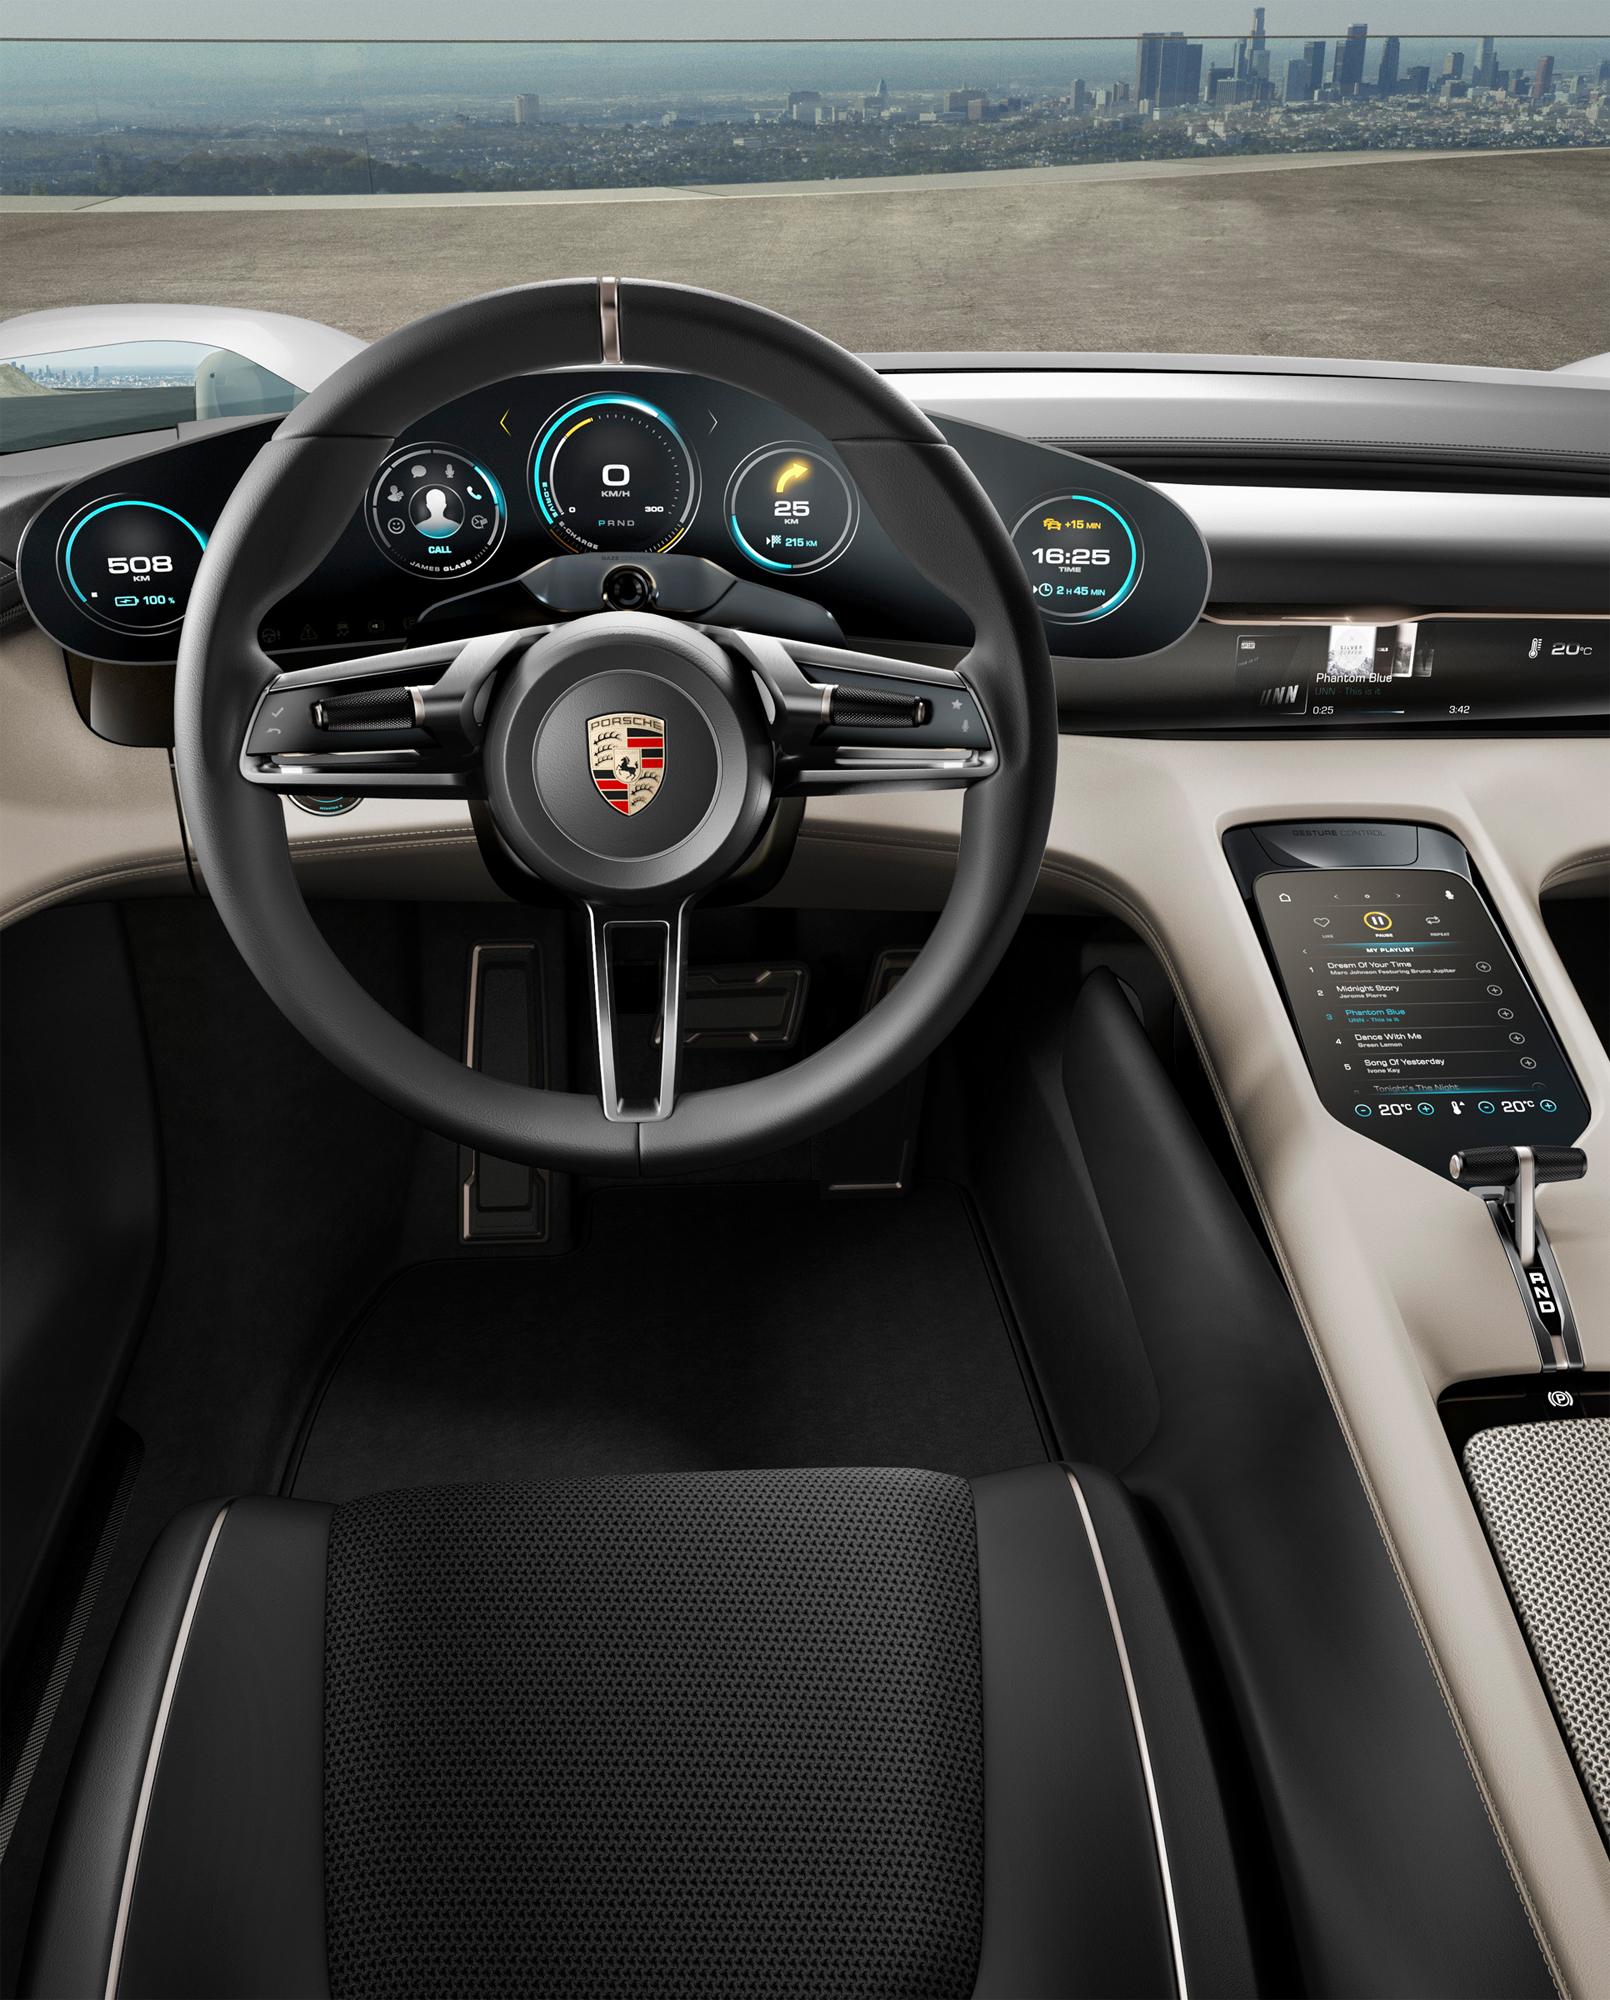 Porsche Mission E: 600 hp, 500 kilometer driving range, 15 minutes charging time